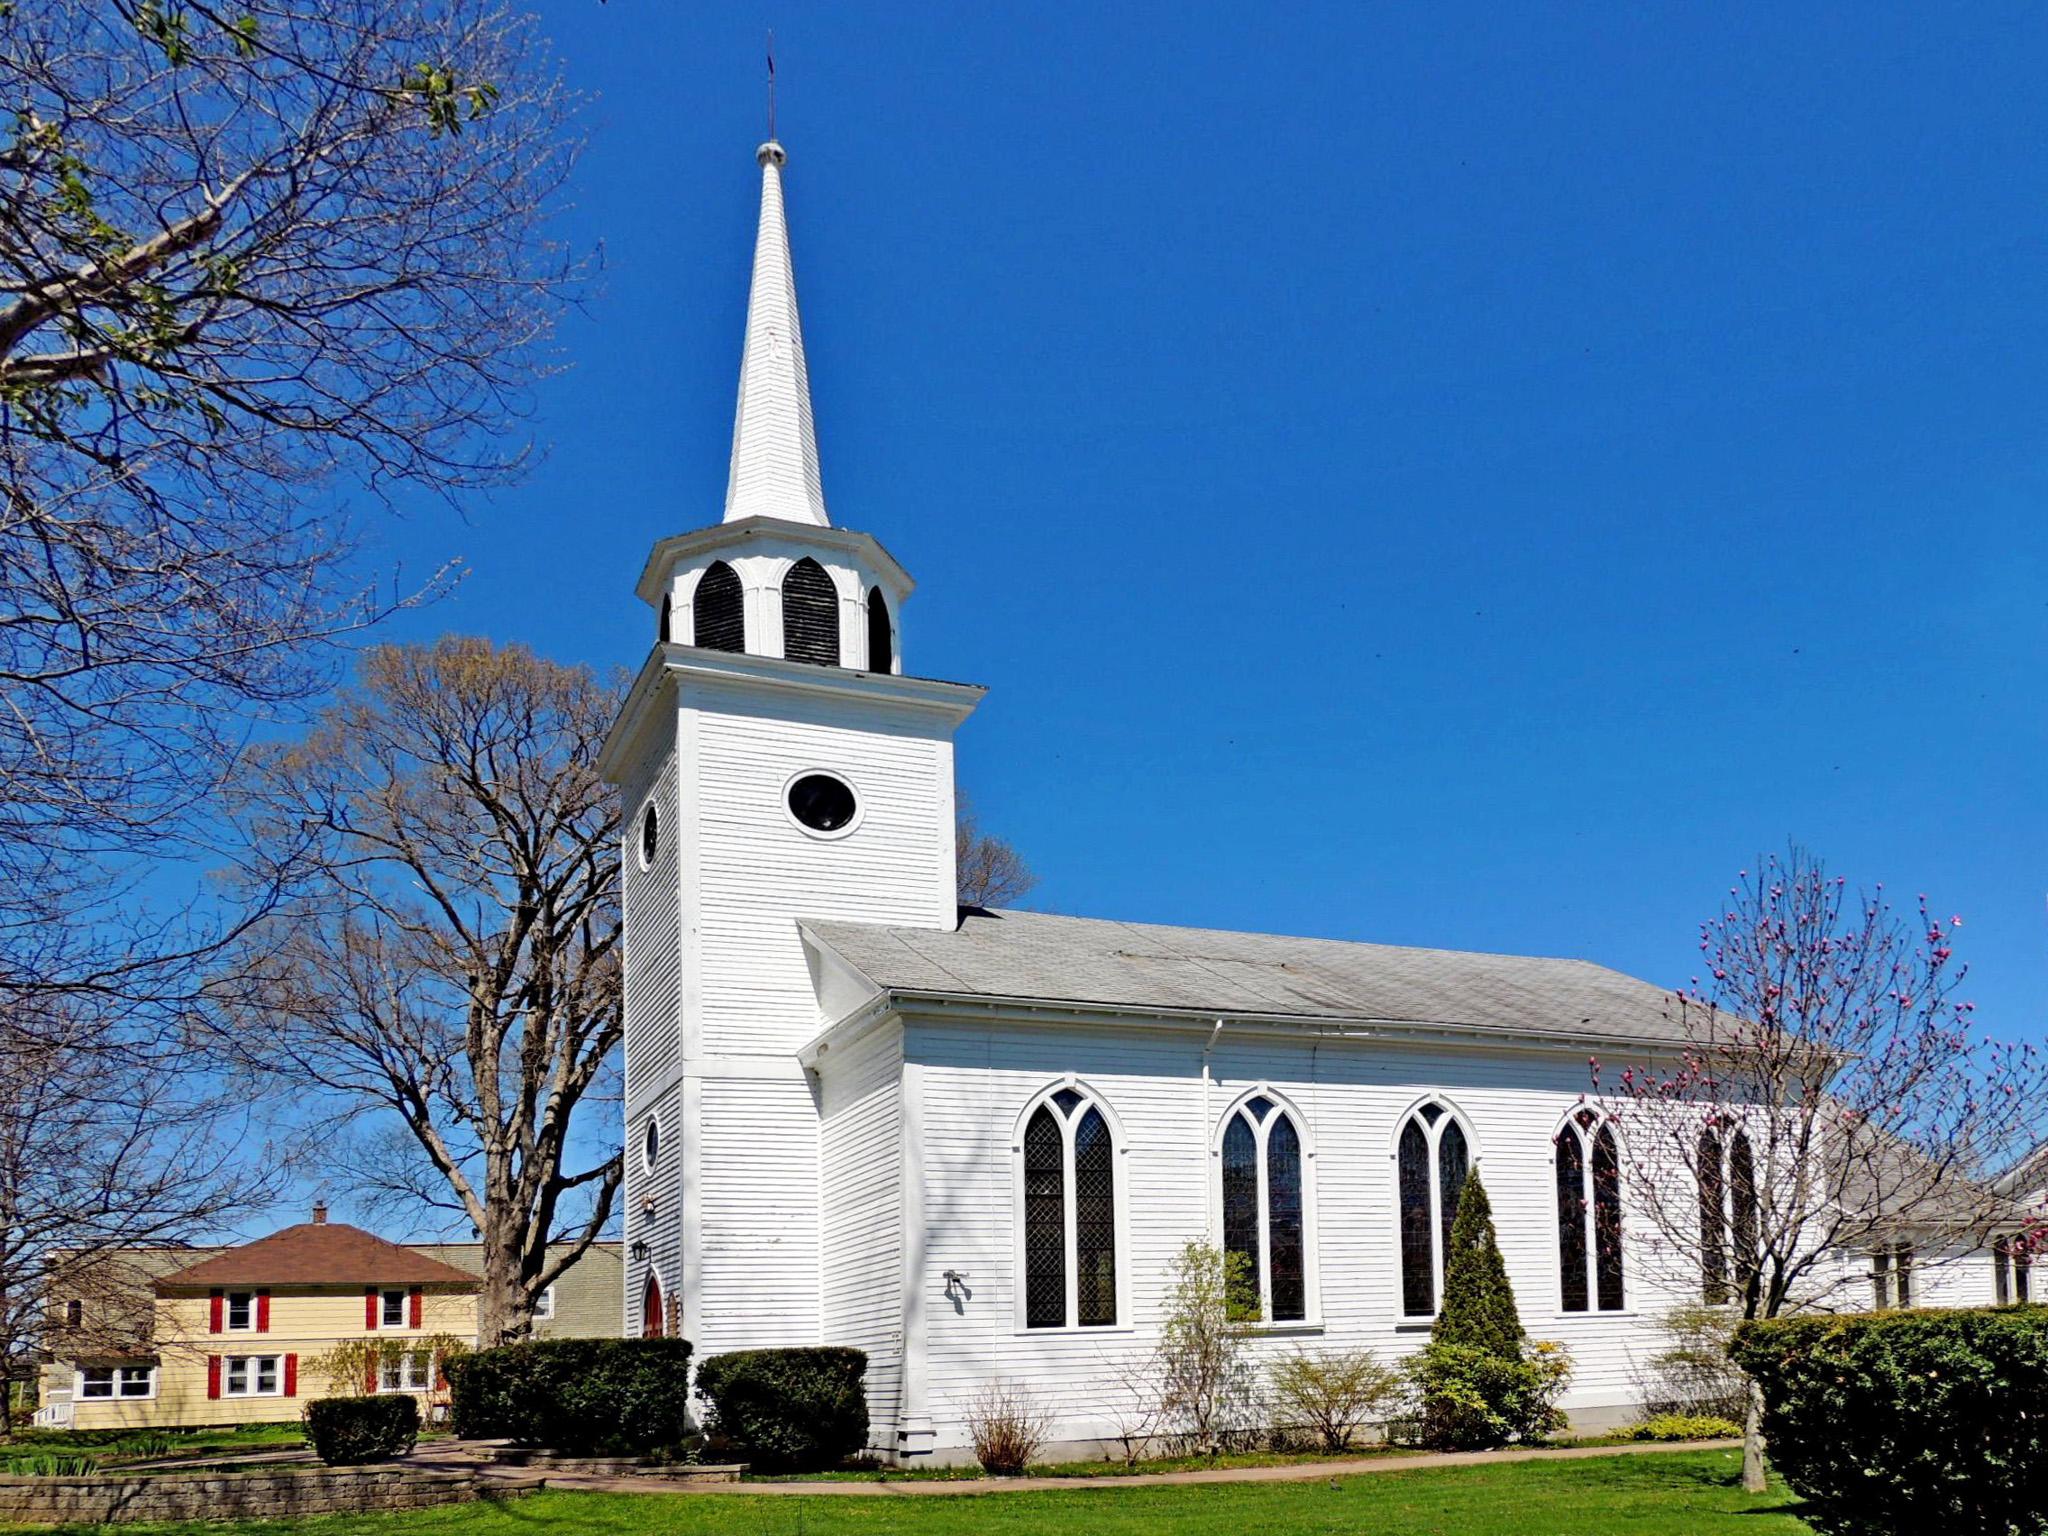 St Lukes Anglican Church, Annapolis Royal